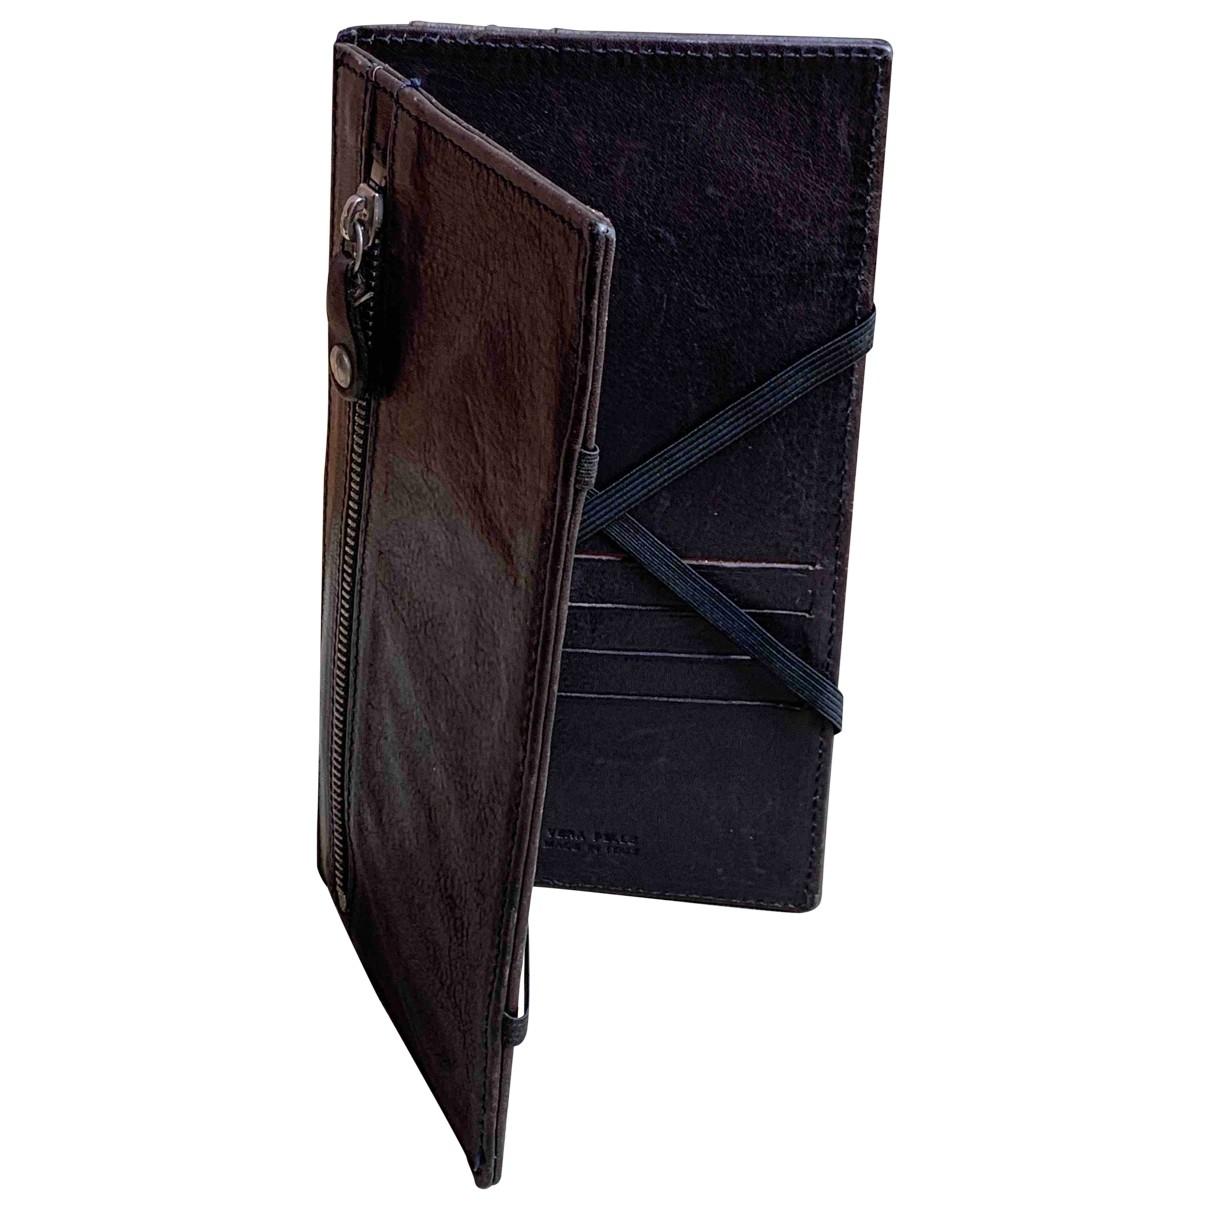 Maison Martin Margiela \N Blue Leather Small bag, wallet & cases for Men \N